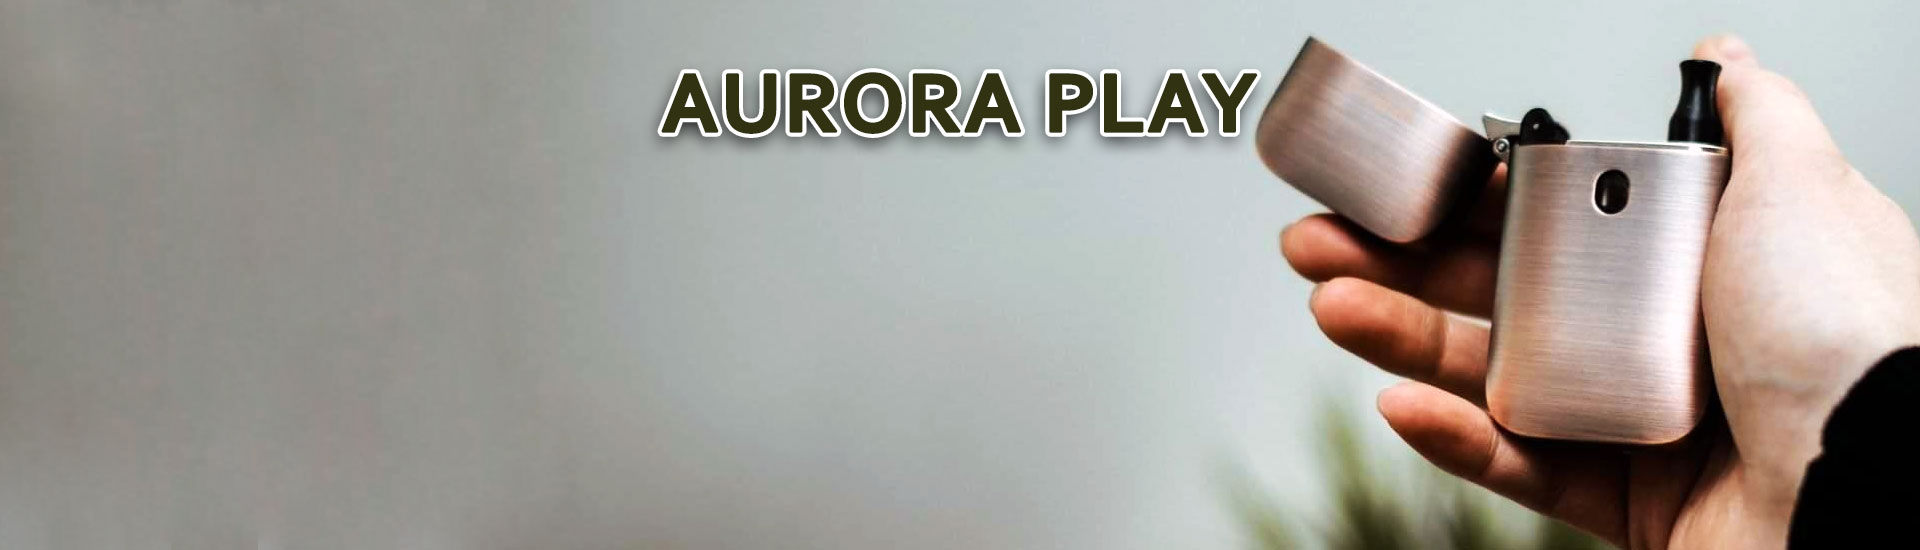 AURORA-PLAY-back